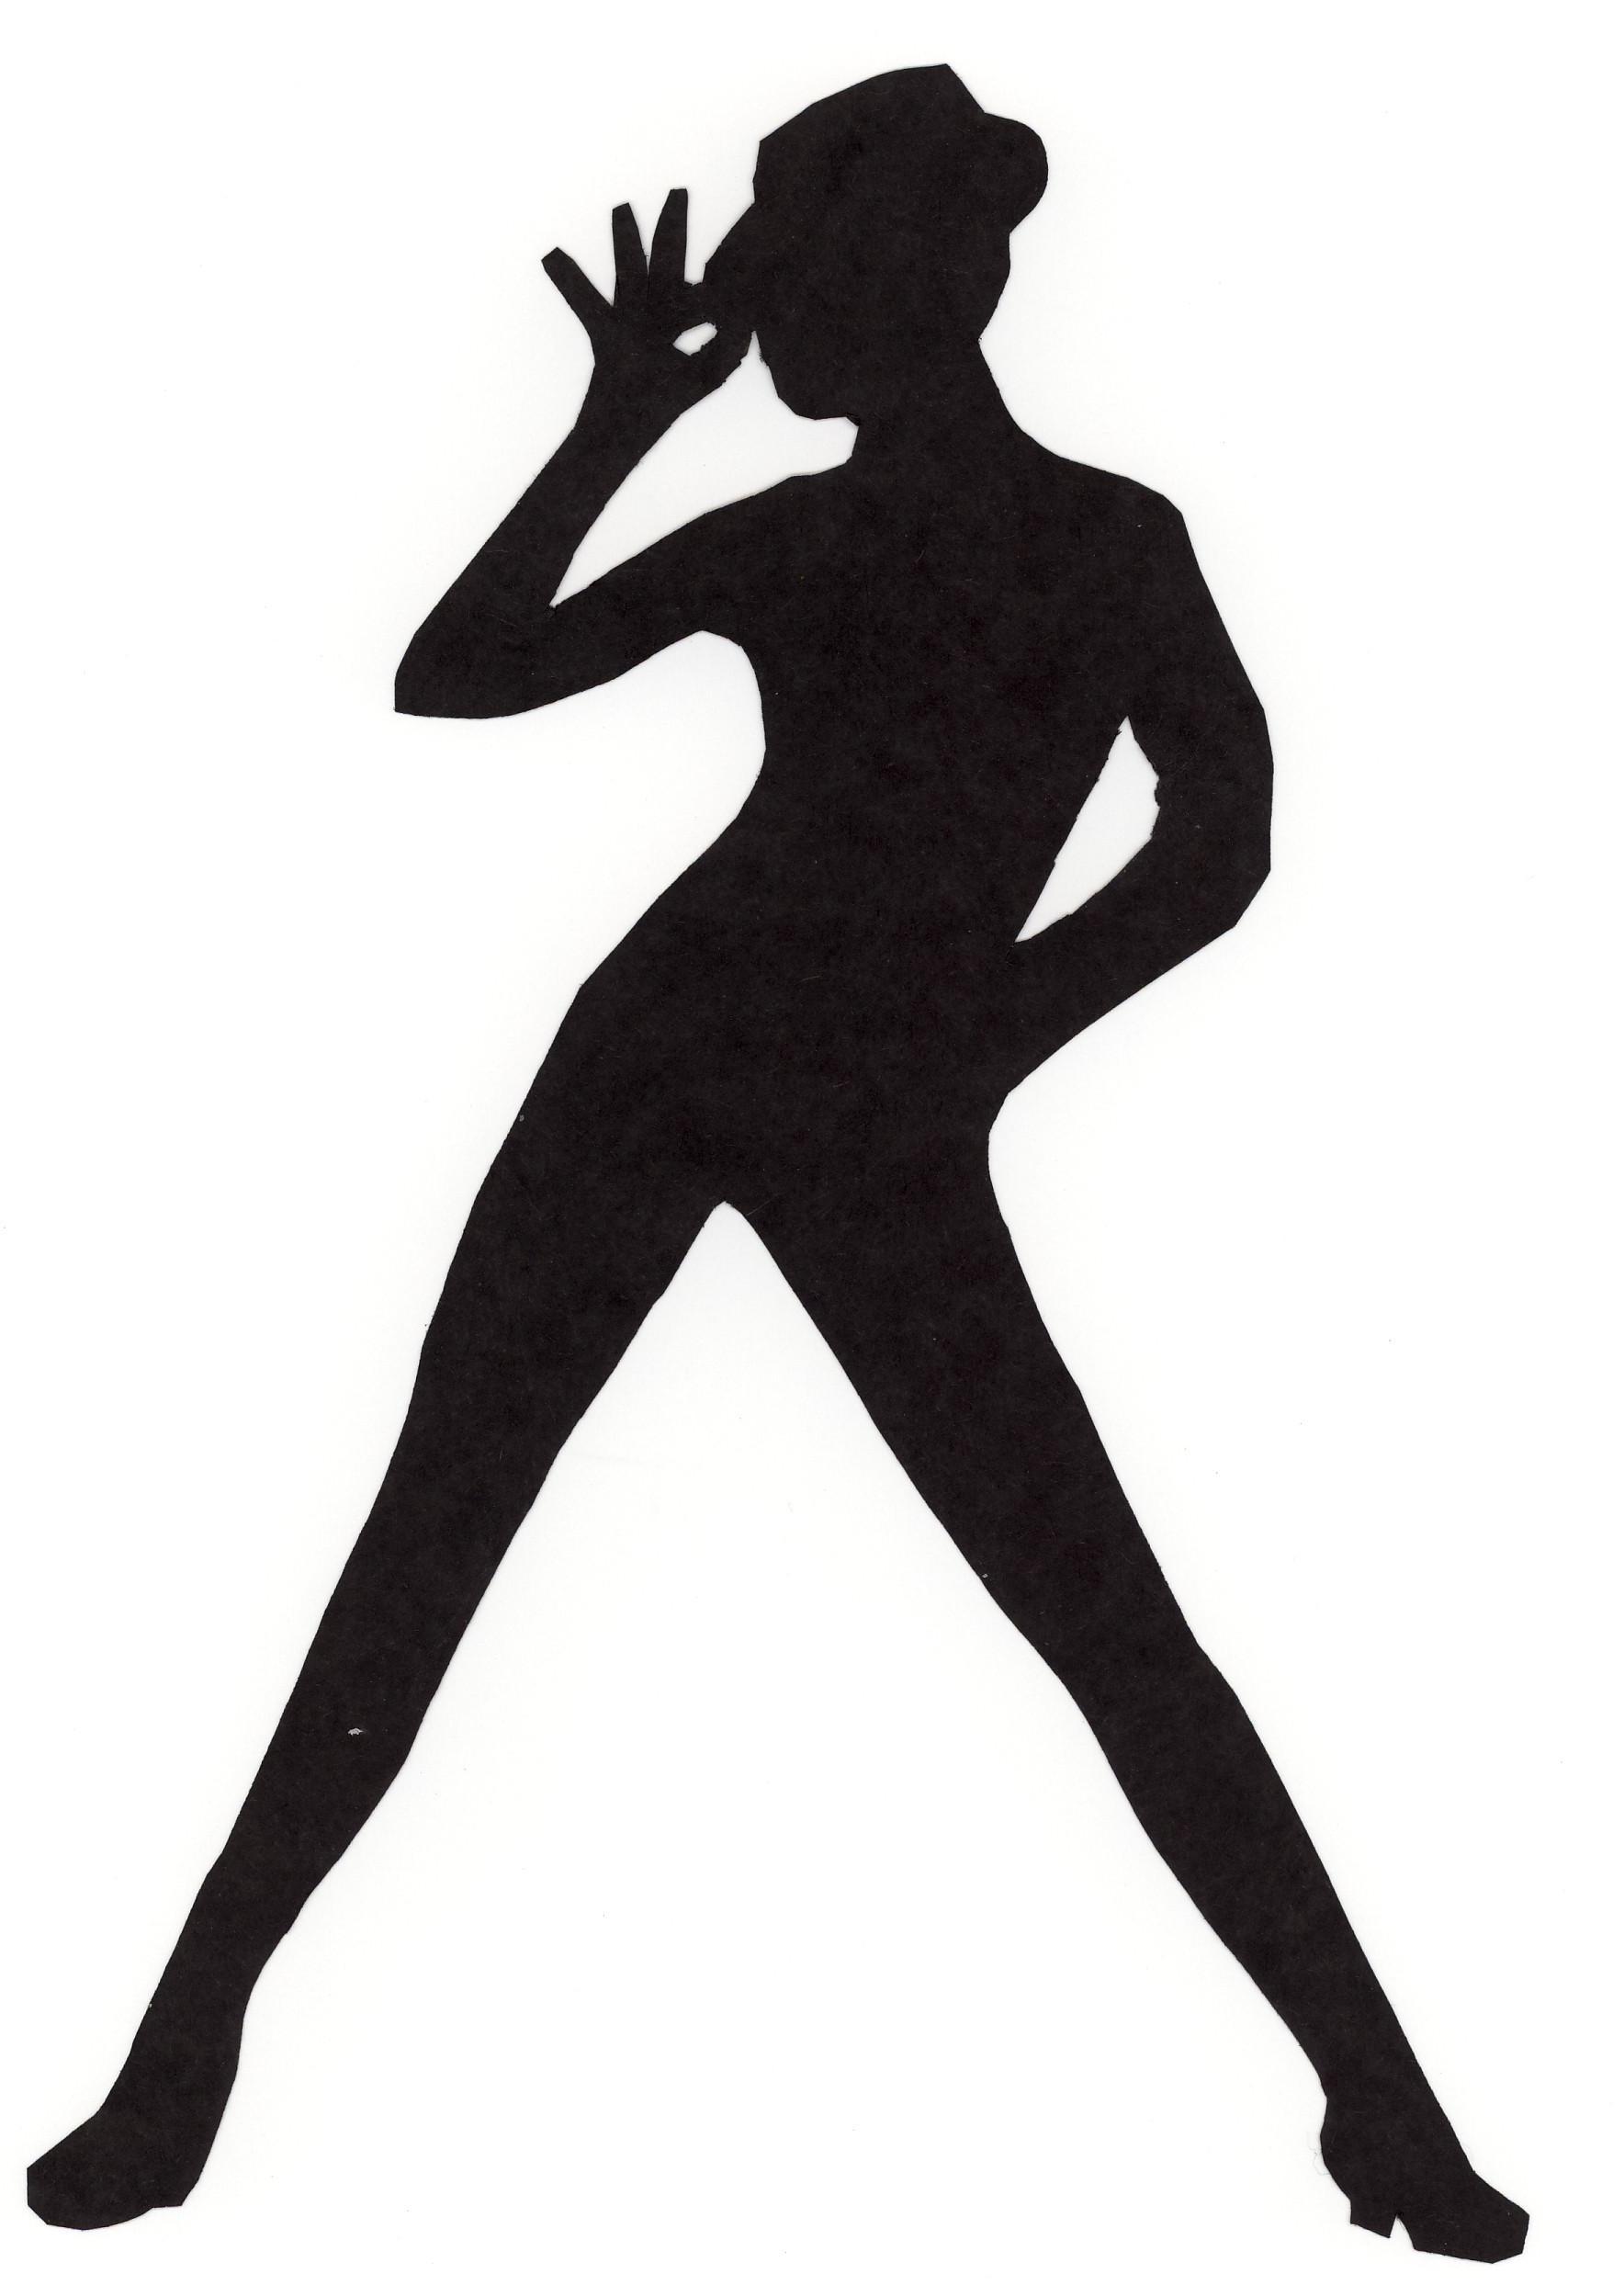 Jazz dance clipart 7 » Clipart Station.